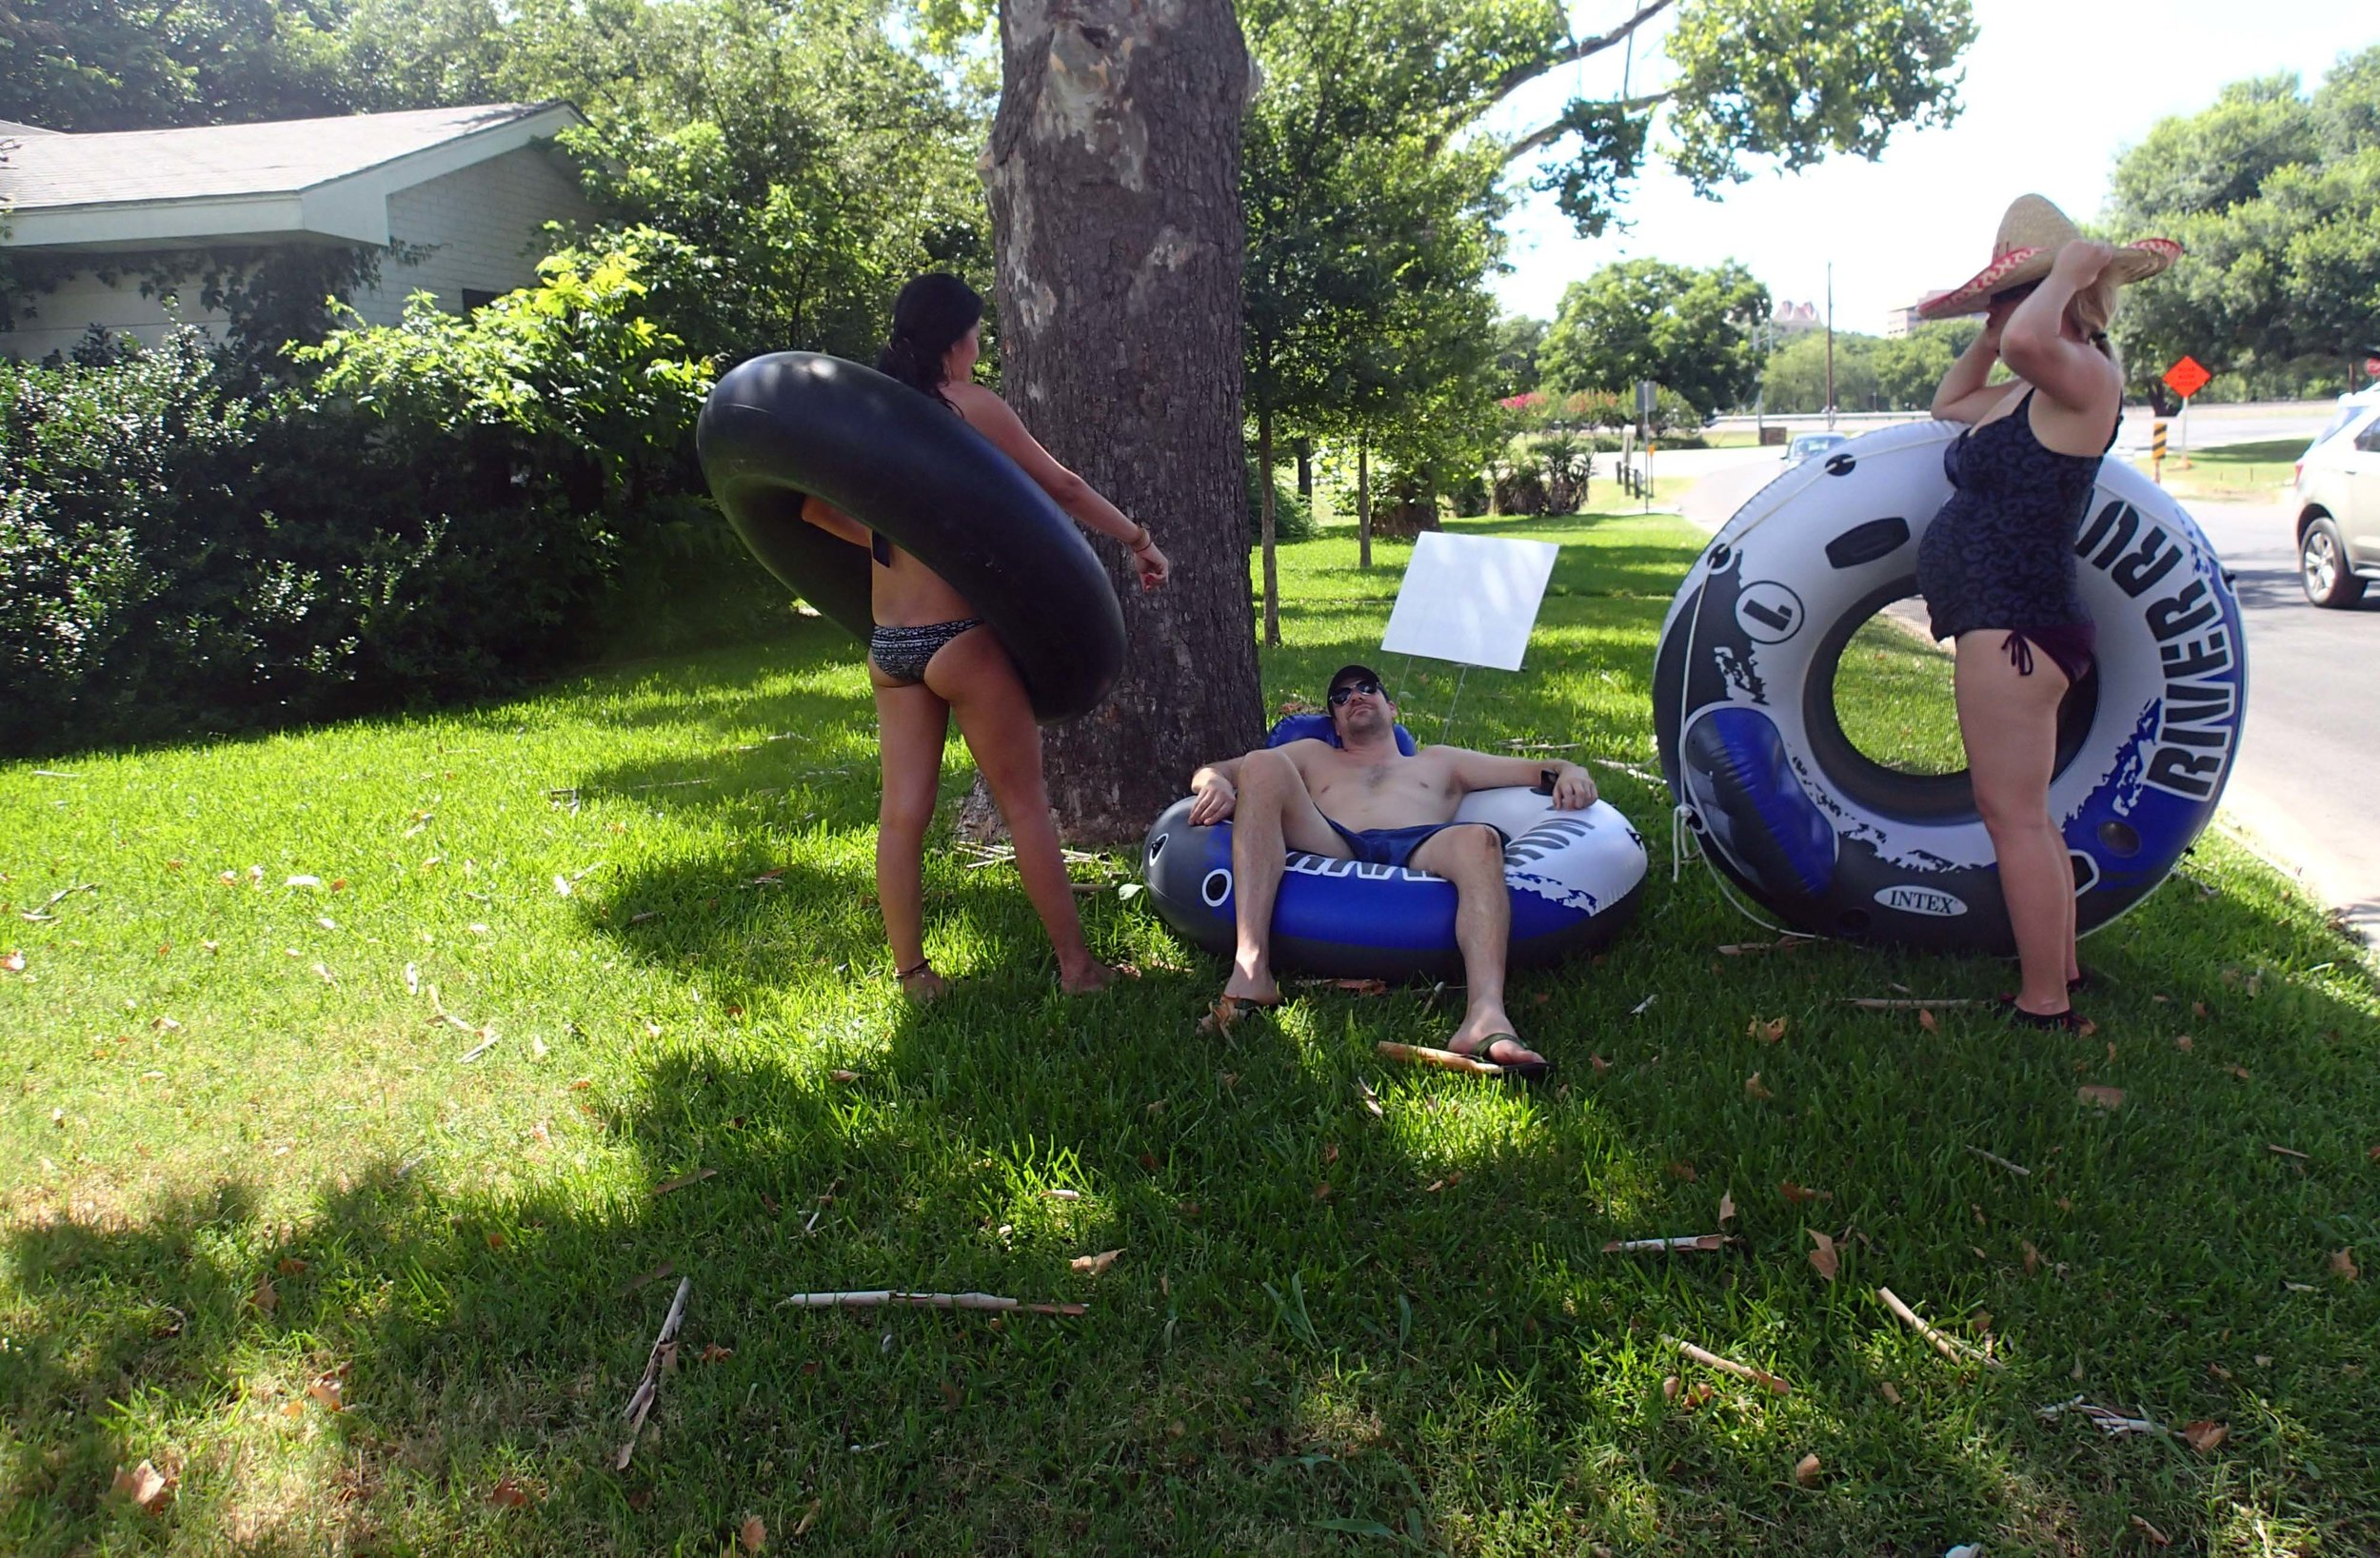 front yard tubing.jpg